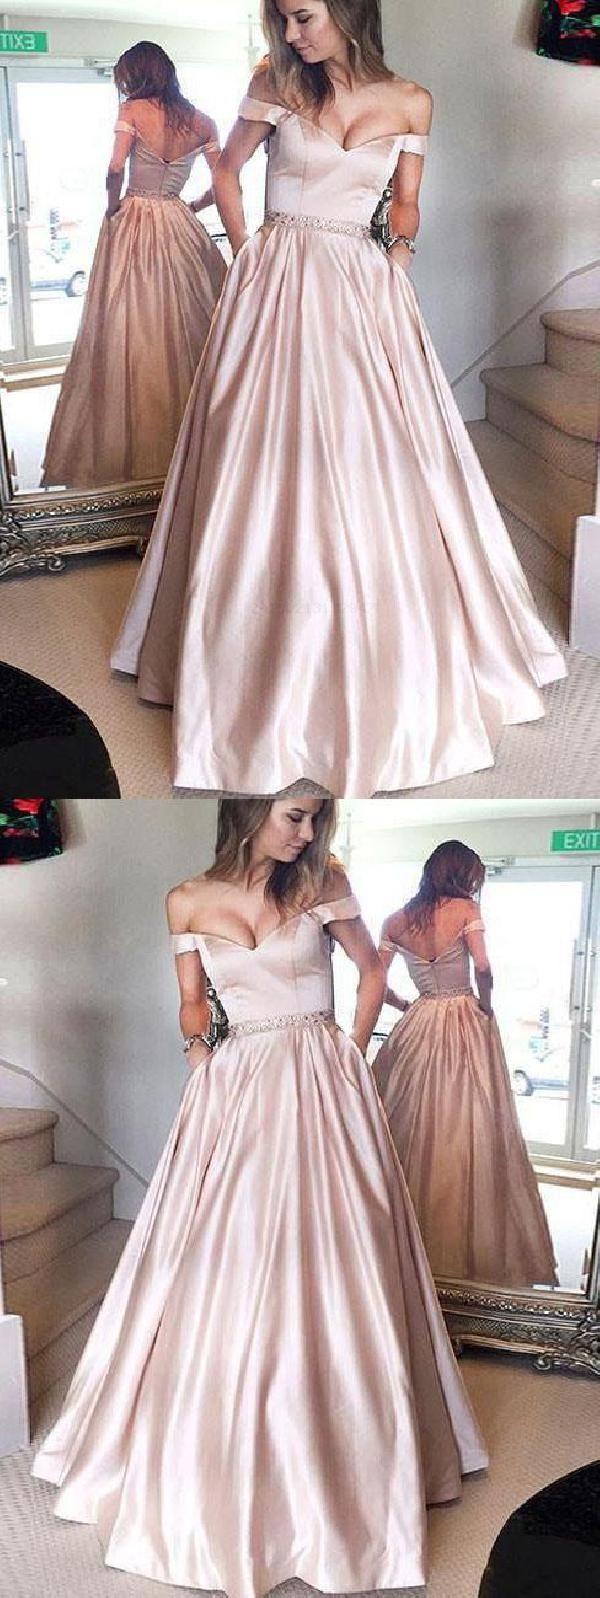 b78f19823fa Off Shoulder Pale Pink A-line Satin Beaded Prom Dresses Prom Dresses